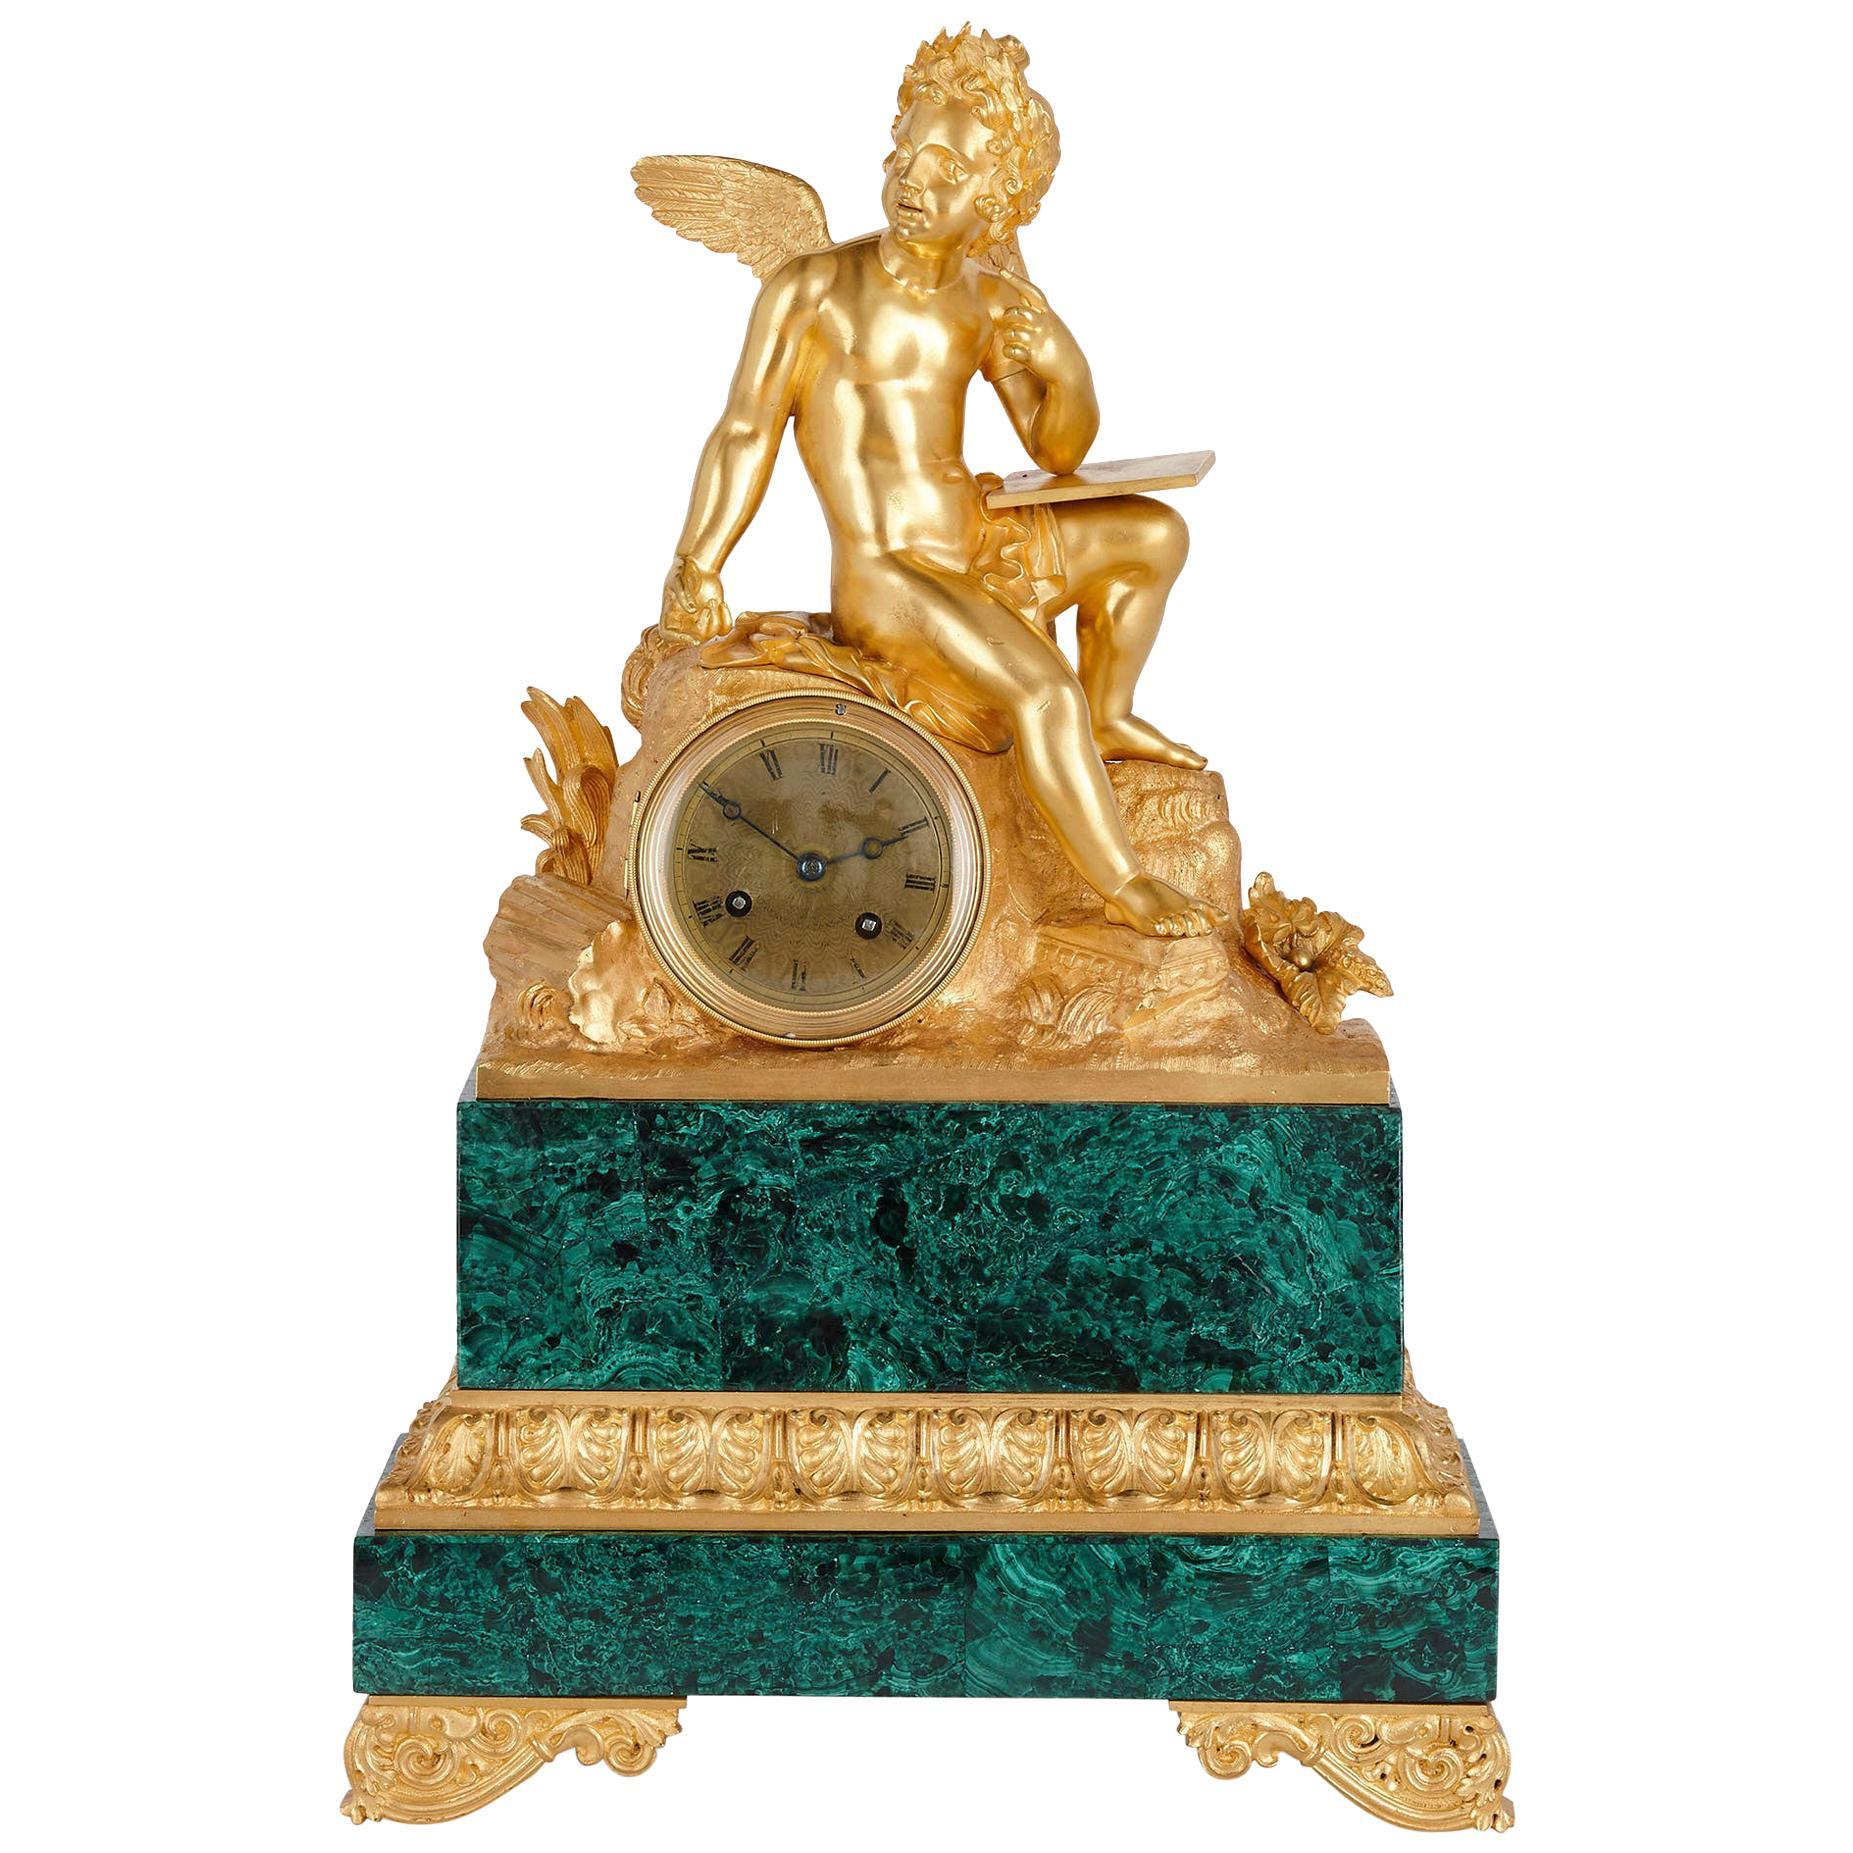 French Neoclassical Malachite and Gilt Bronze Mantel Clock